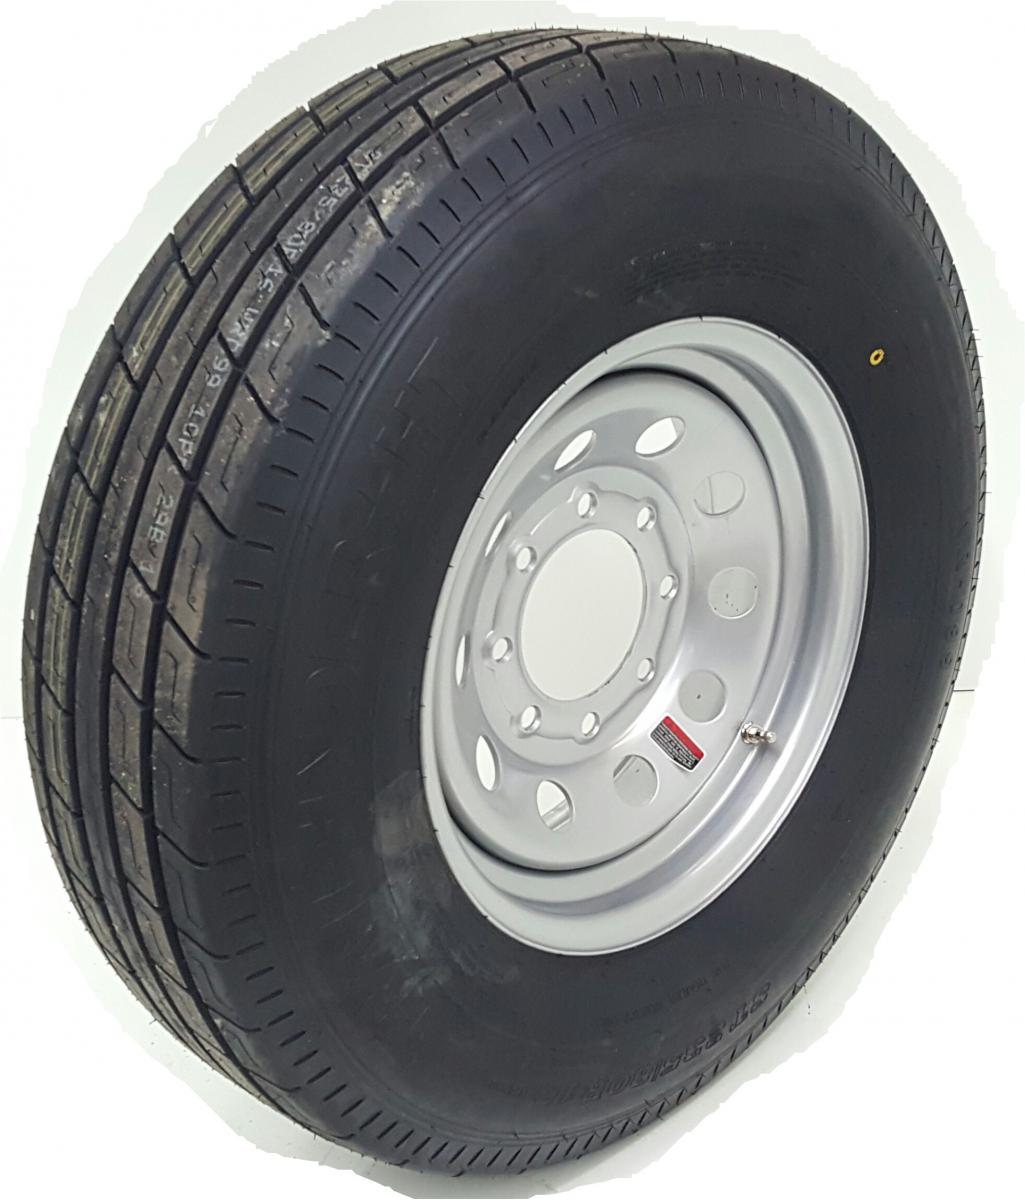 Trailer Axles With Wheels : Axle set ply tire wheels r k